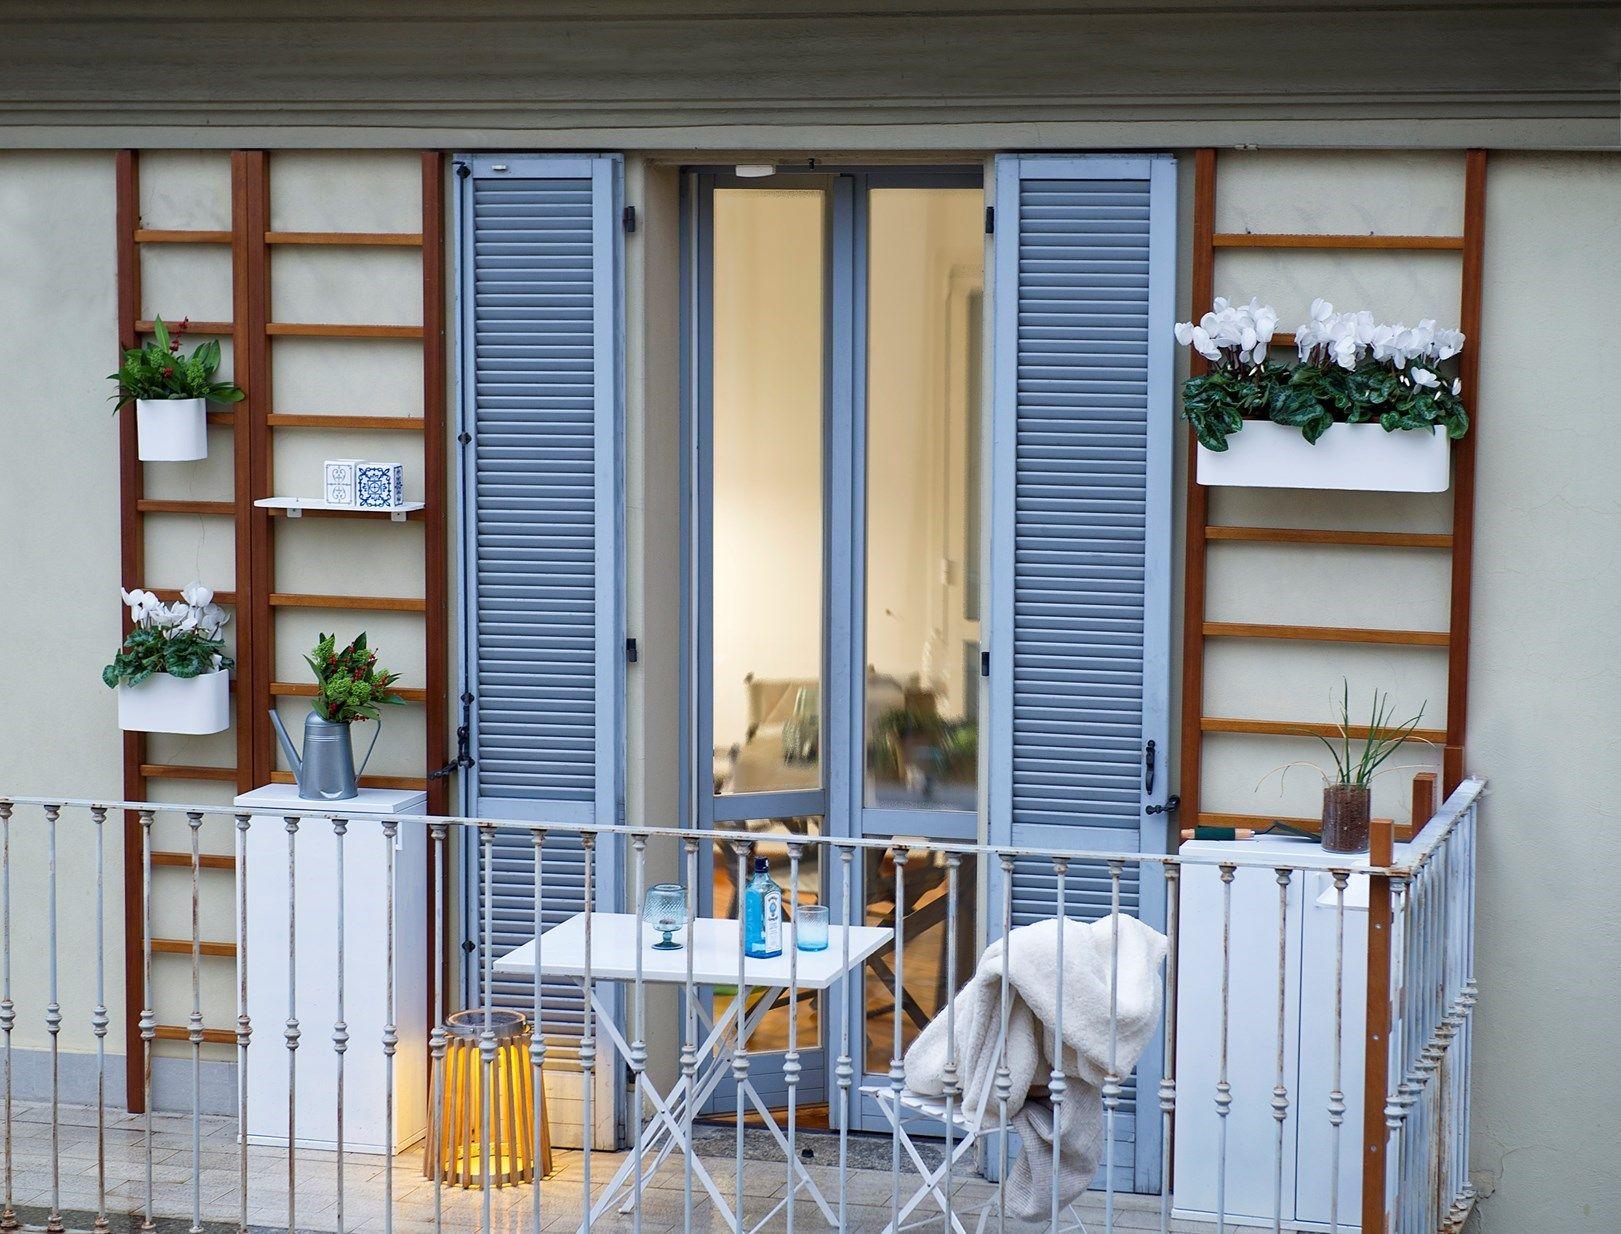 Barriere Antirumore Per Balconi il balcone diventa multitasking